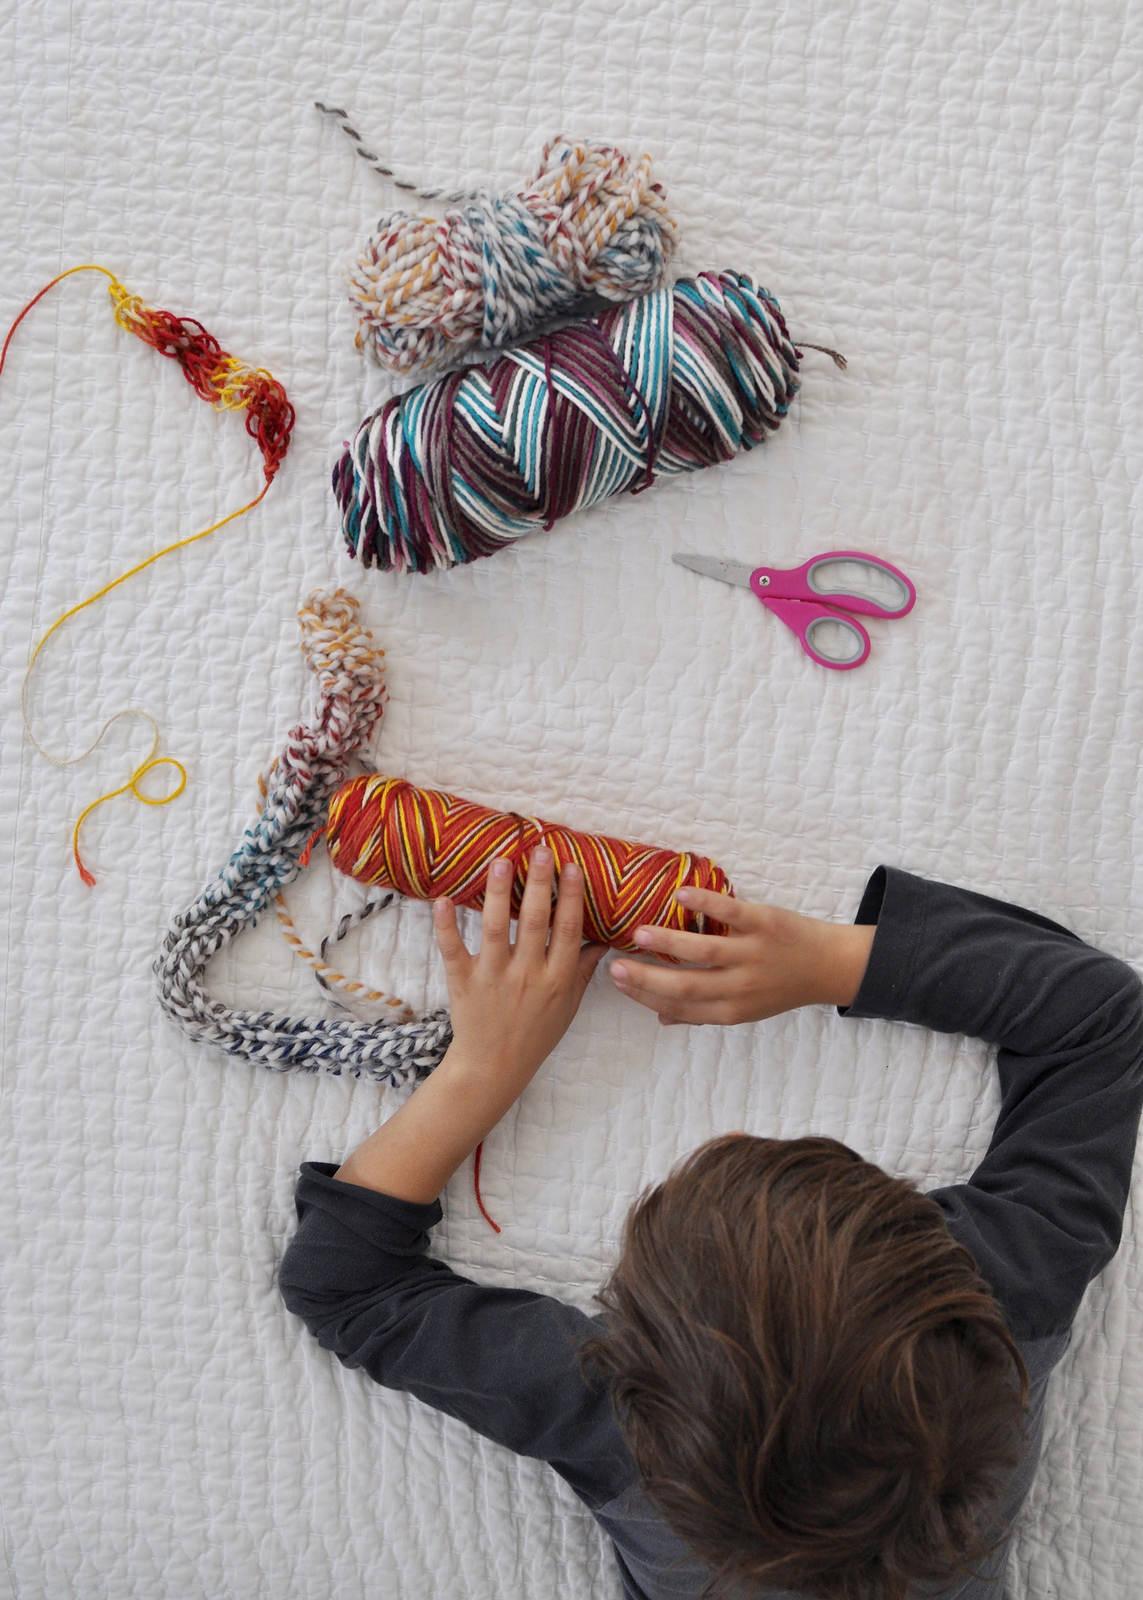 Montessori-Inspired: Finger-Knitting with Oliver